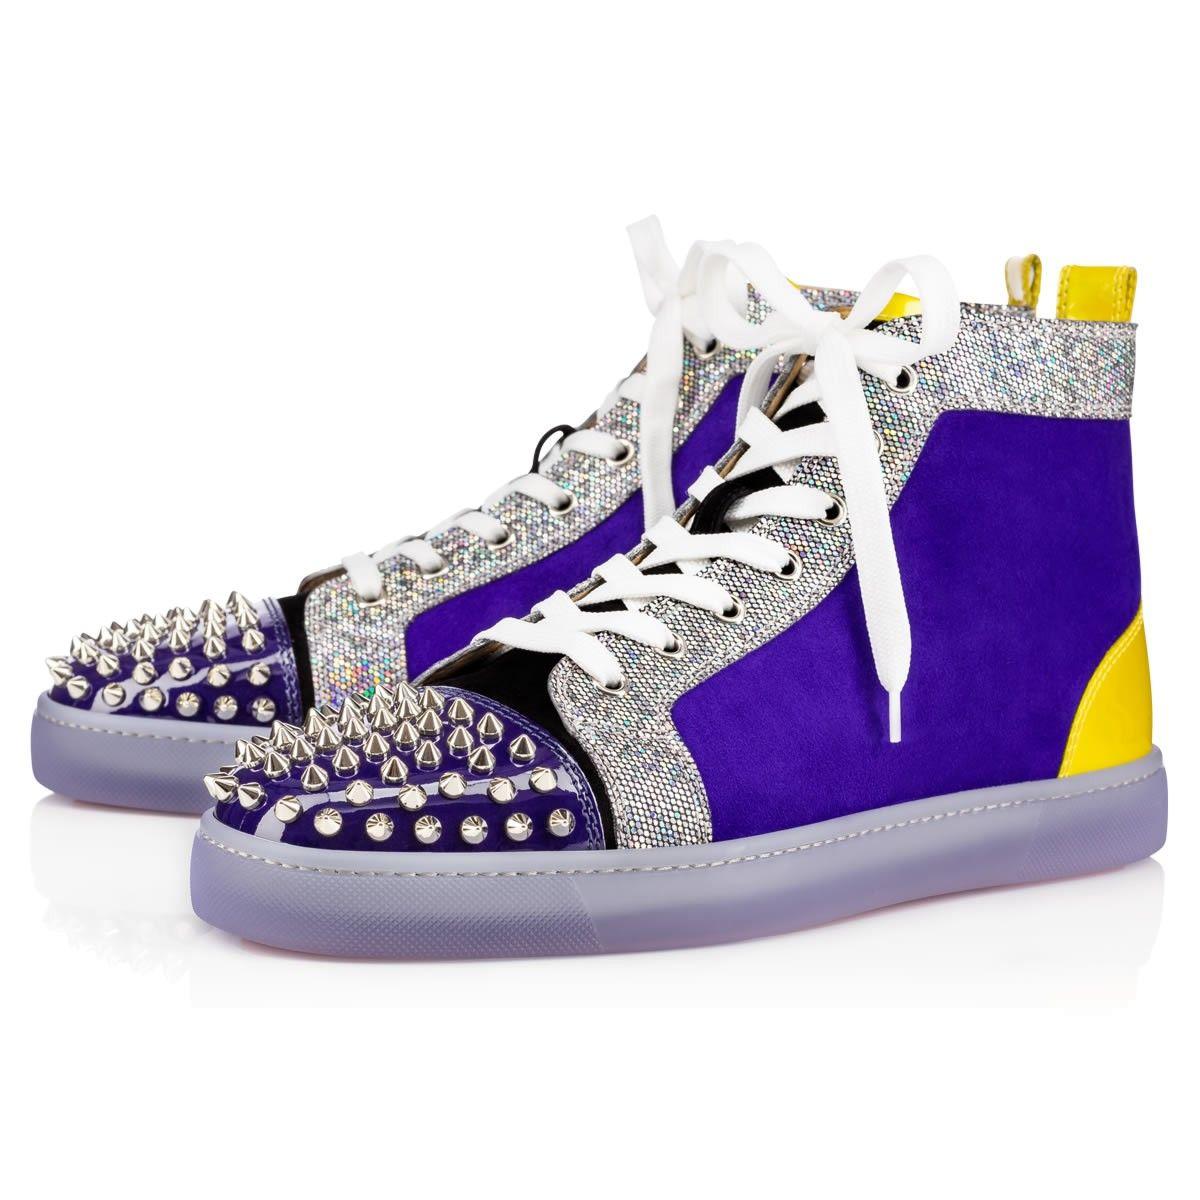 d27b4d355ea CHRISTIAN LOUBOUTIN Lou Spikes Glitter Disco Ball Multicolor Glitter Canvas  - Men Shoes - Christian Louboutin.  christianlouboutin  shoes